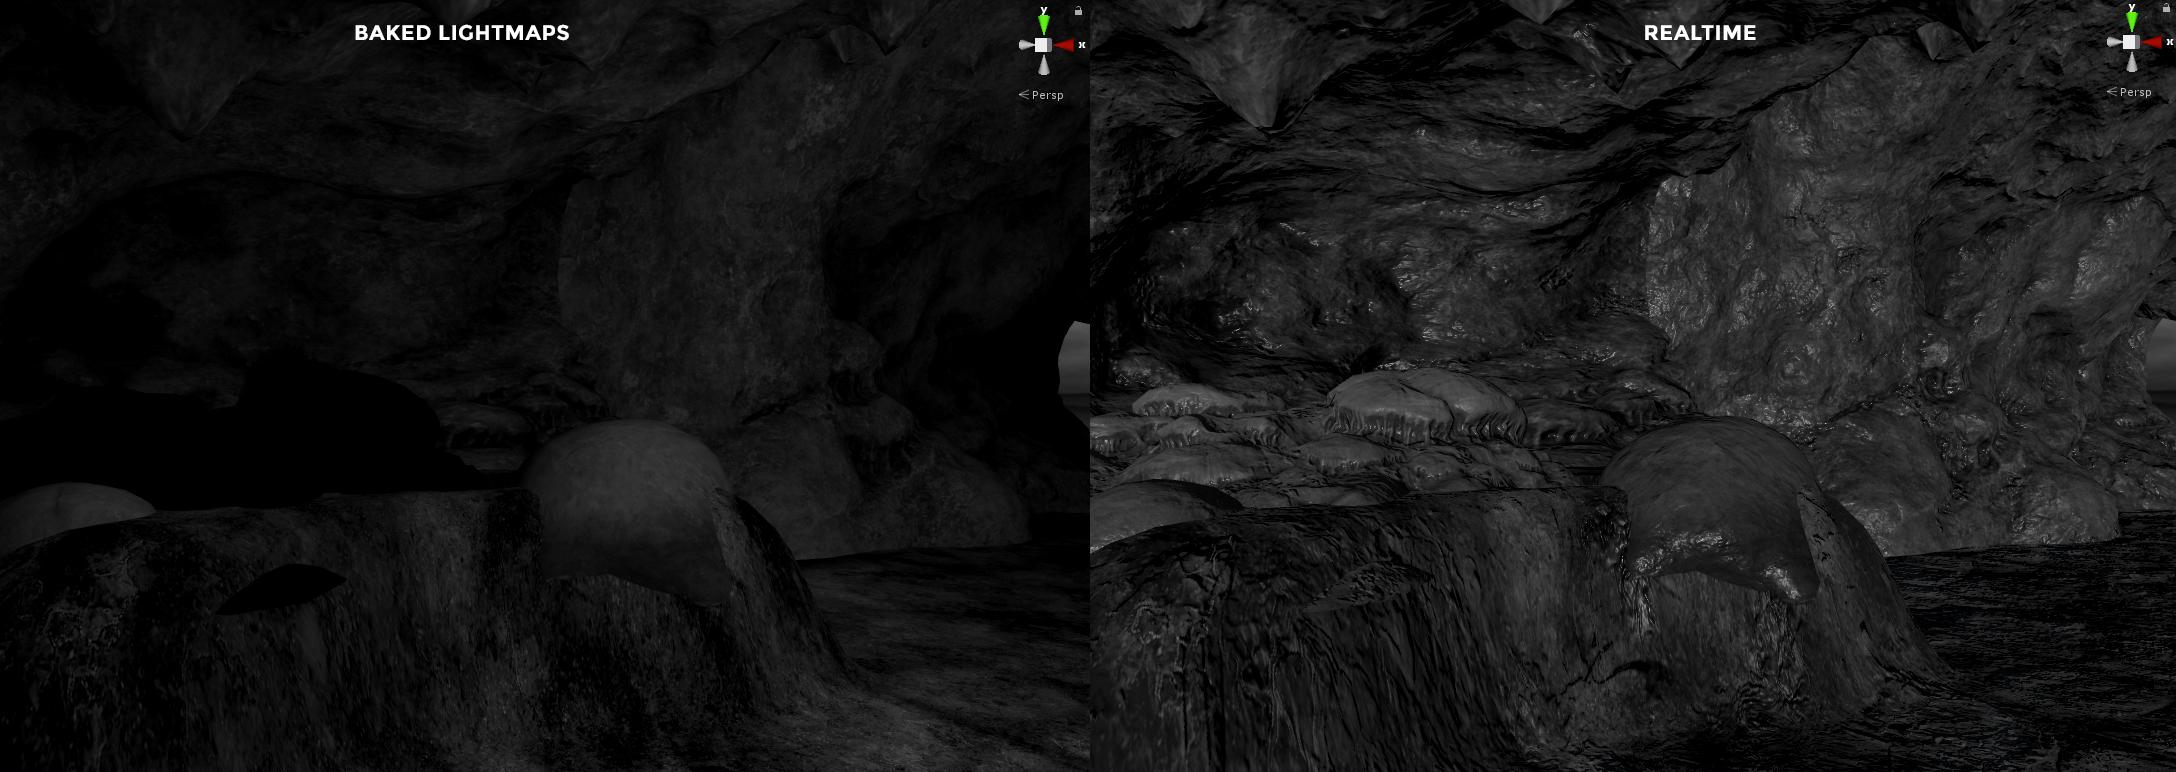 cave-lighting.jpg